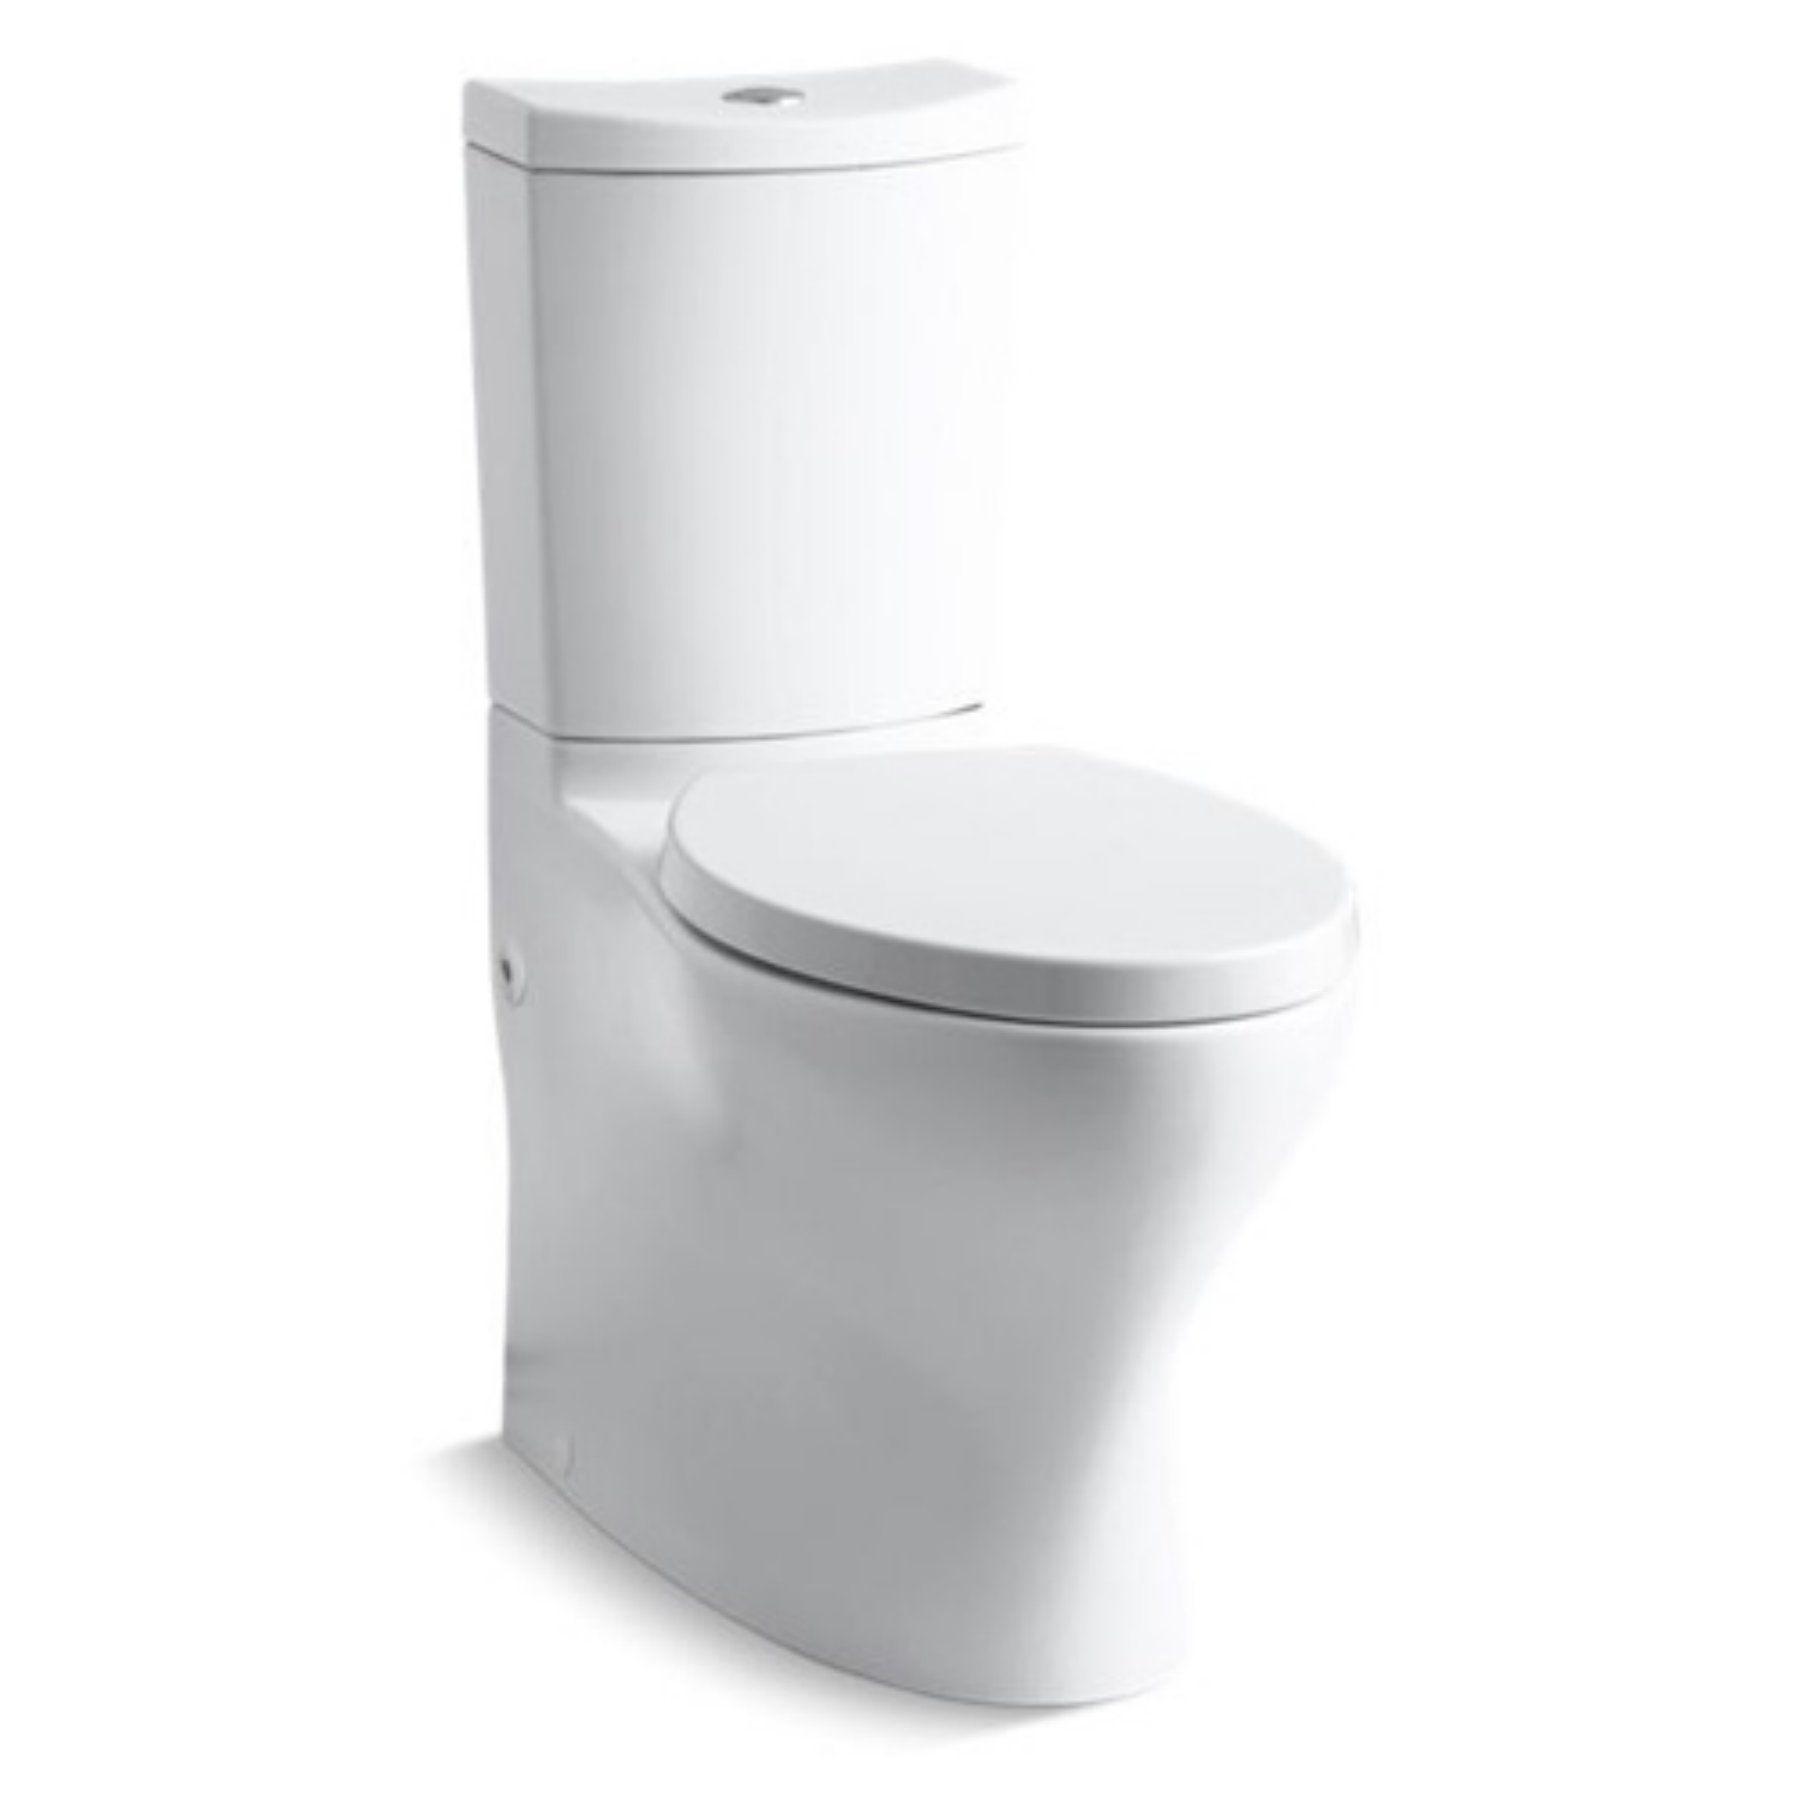 Kohler Persuade Curv Koh6355 Comfort Height Two Piece Elongated Toilet Toilet Modern Bathroom Decor Dual Flush Toilet